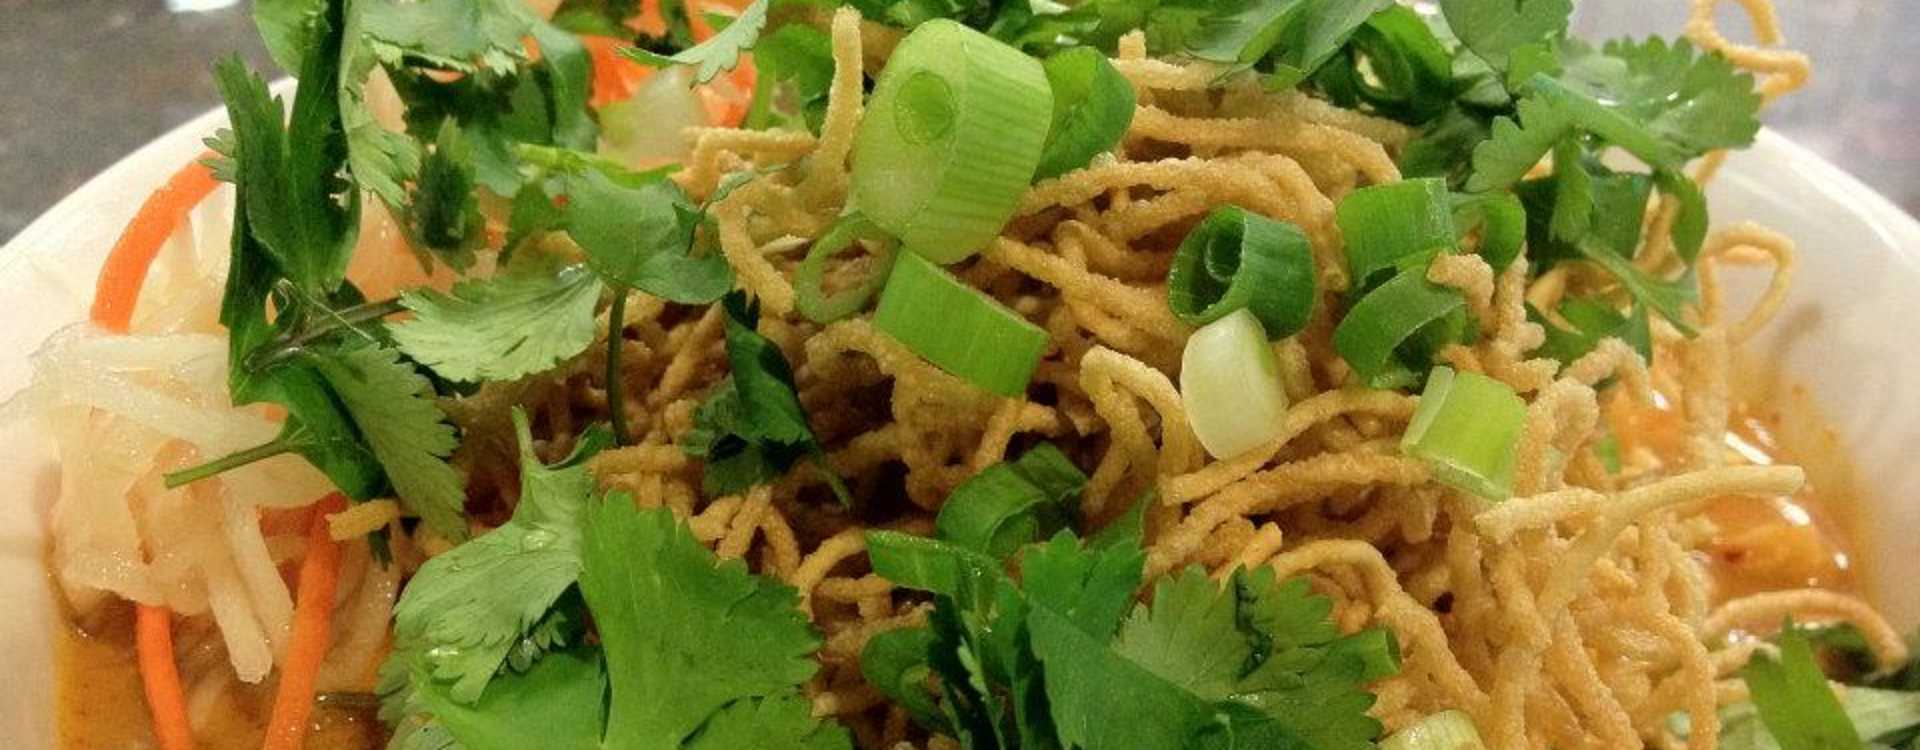 Mango_Thai_Cuisine___Bar-9.jpg